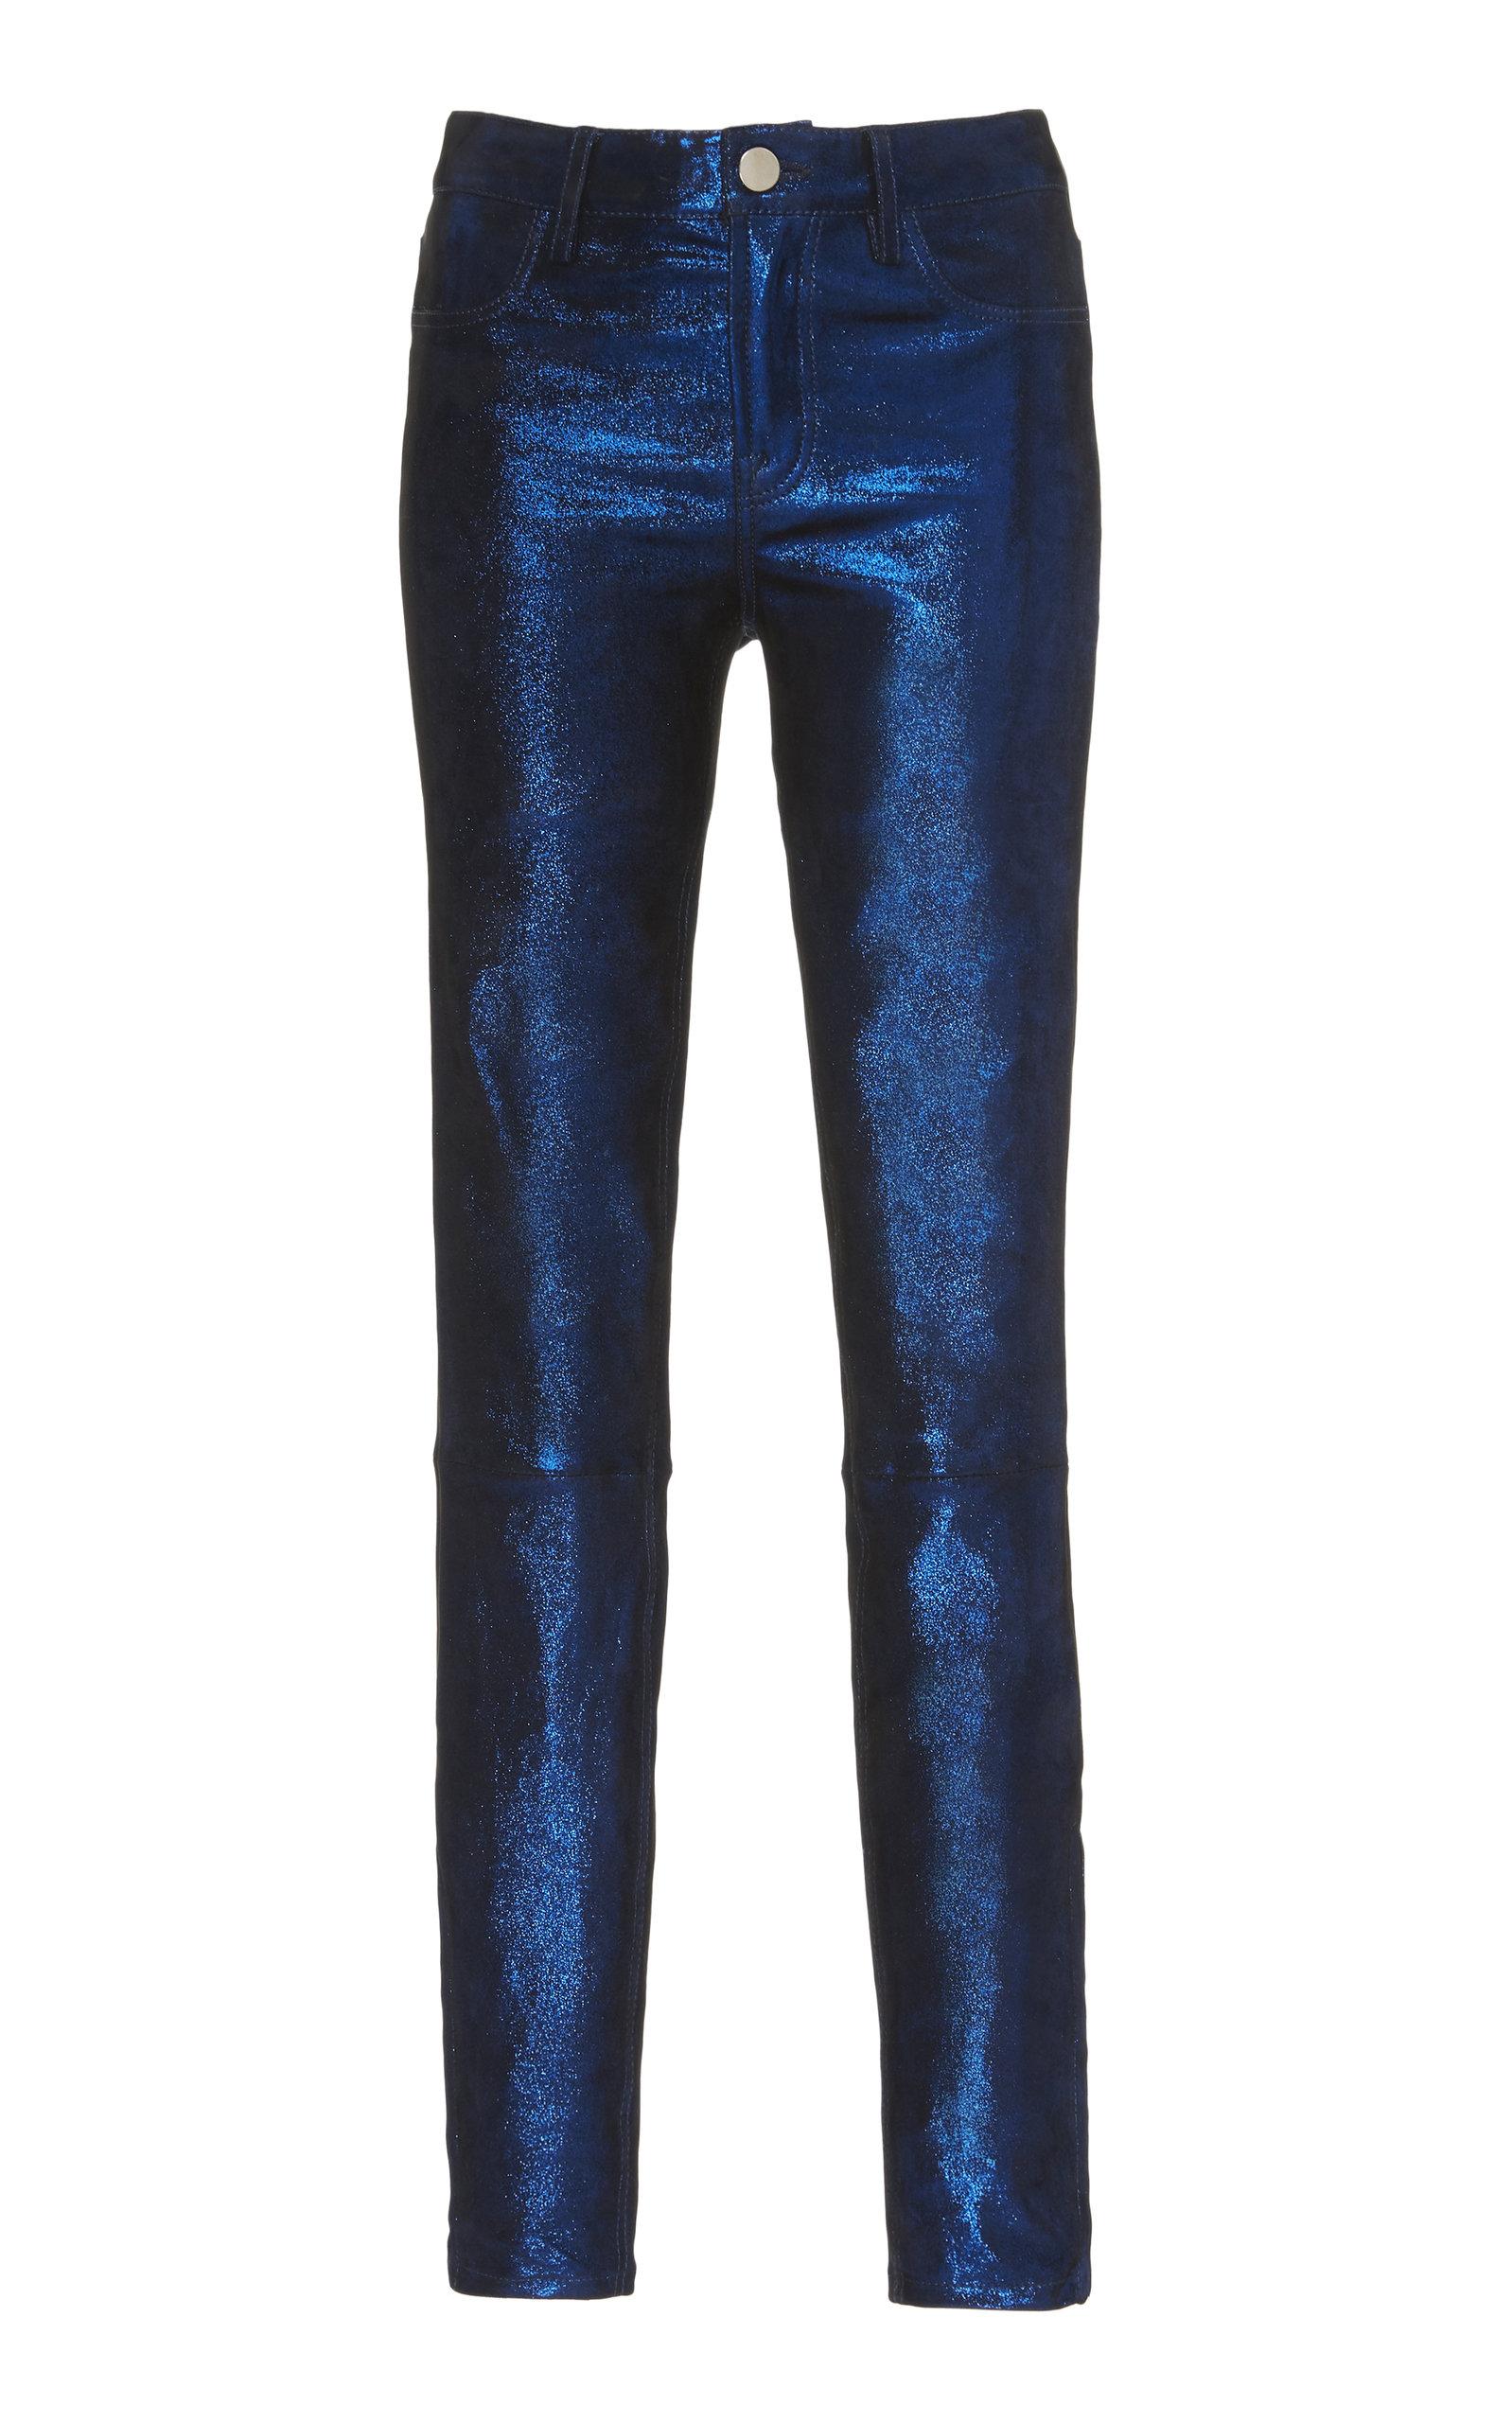 Nour Hammour Pants METALLIC LEATHER PANTS